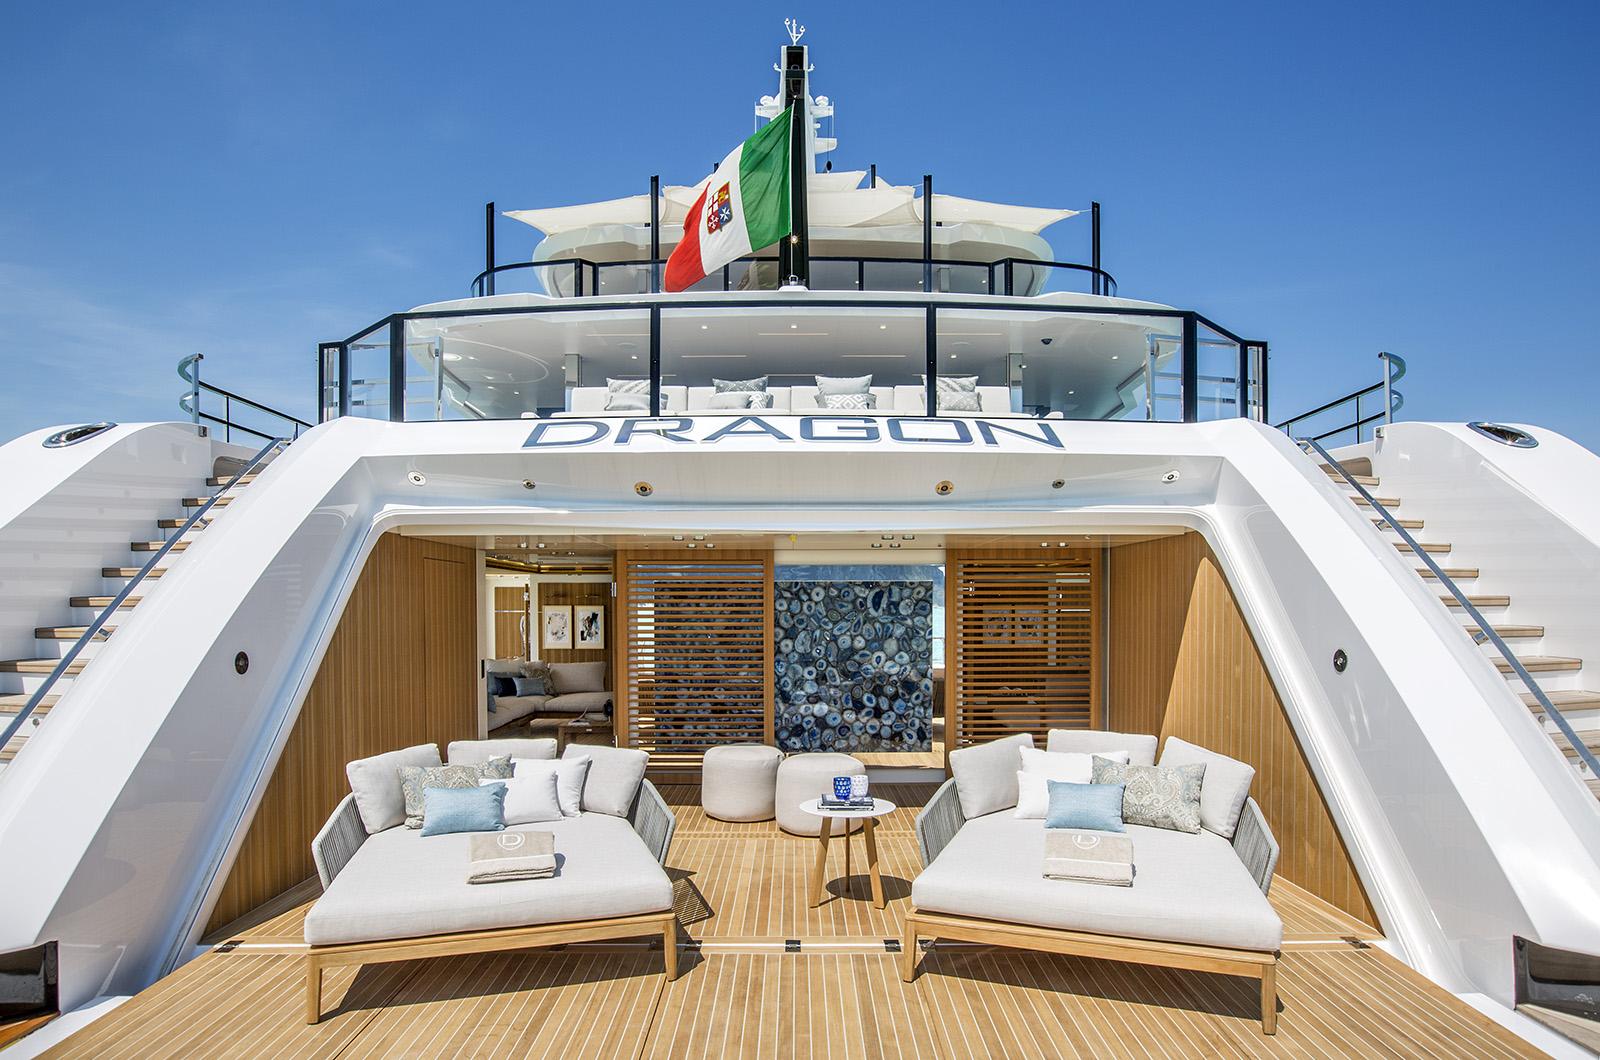 Beach club on the Columbus Yachts Dragon (Photos by Giorgio Baroni)